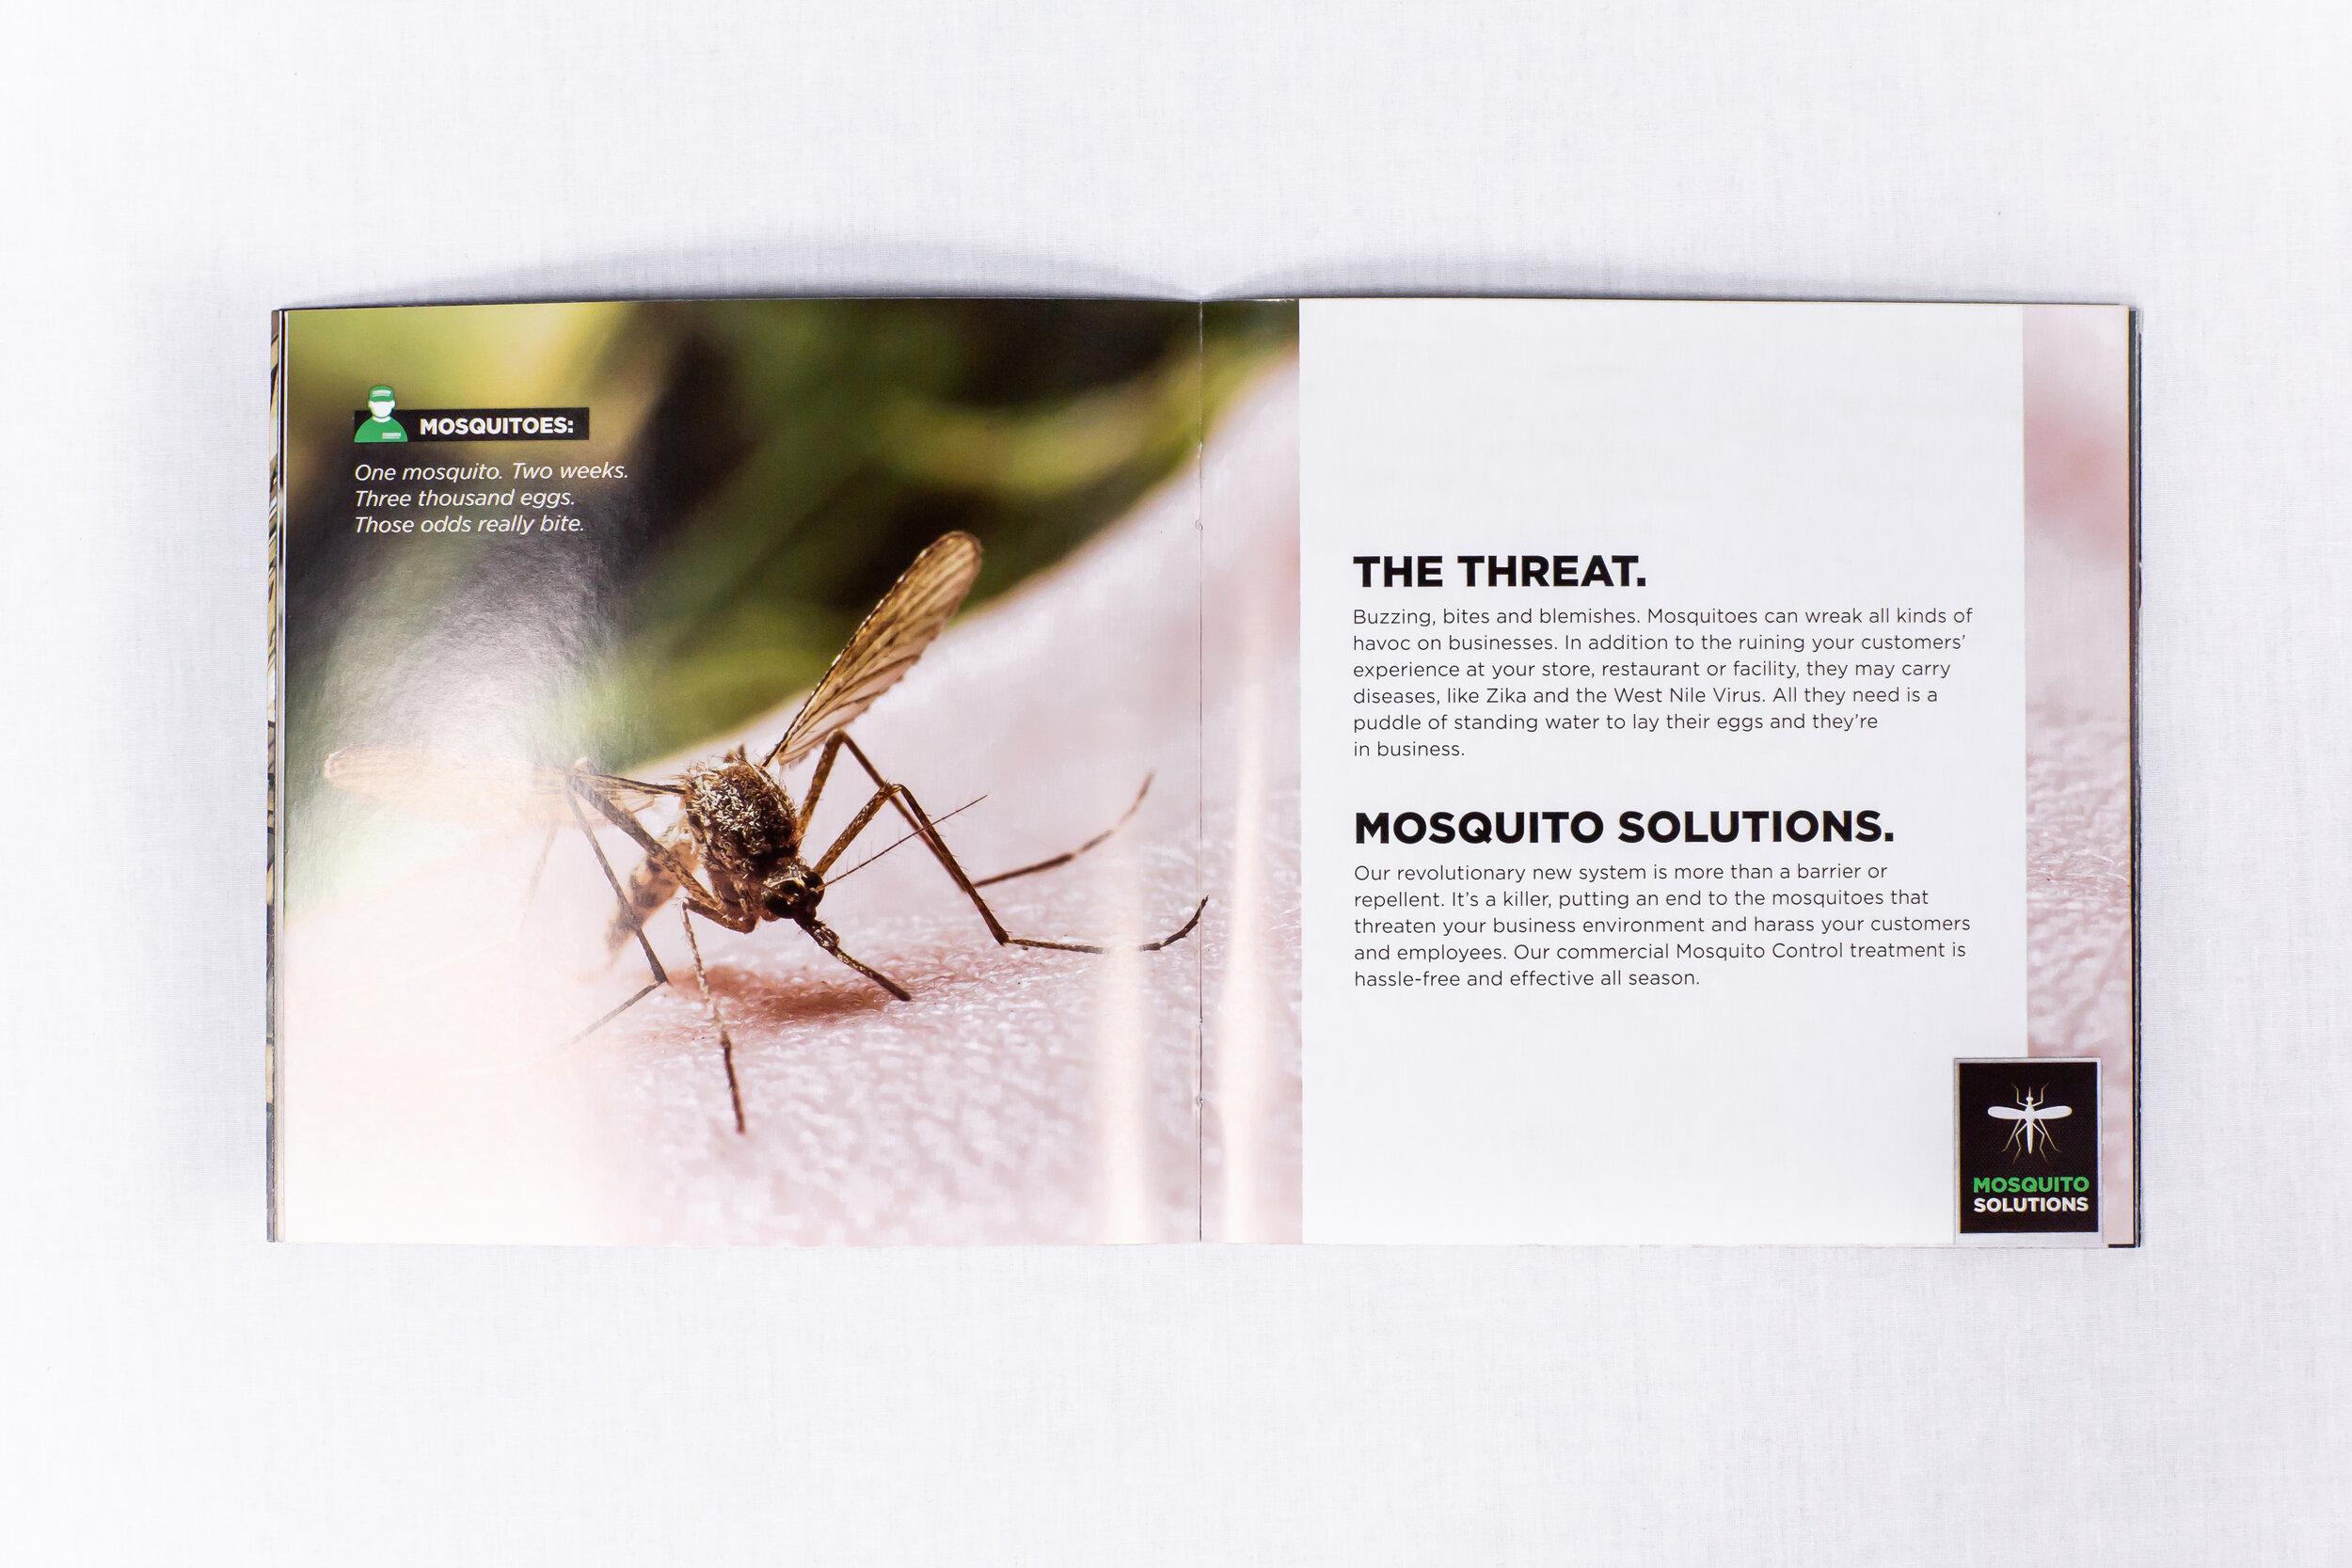 TMXC_NYC_Pest_Brochure_3.jpg